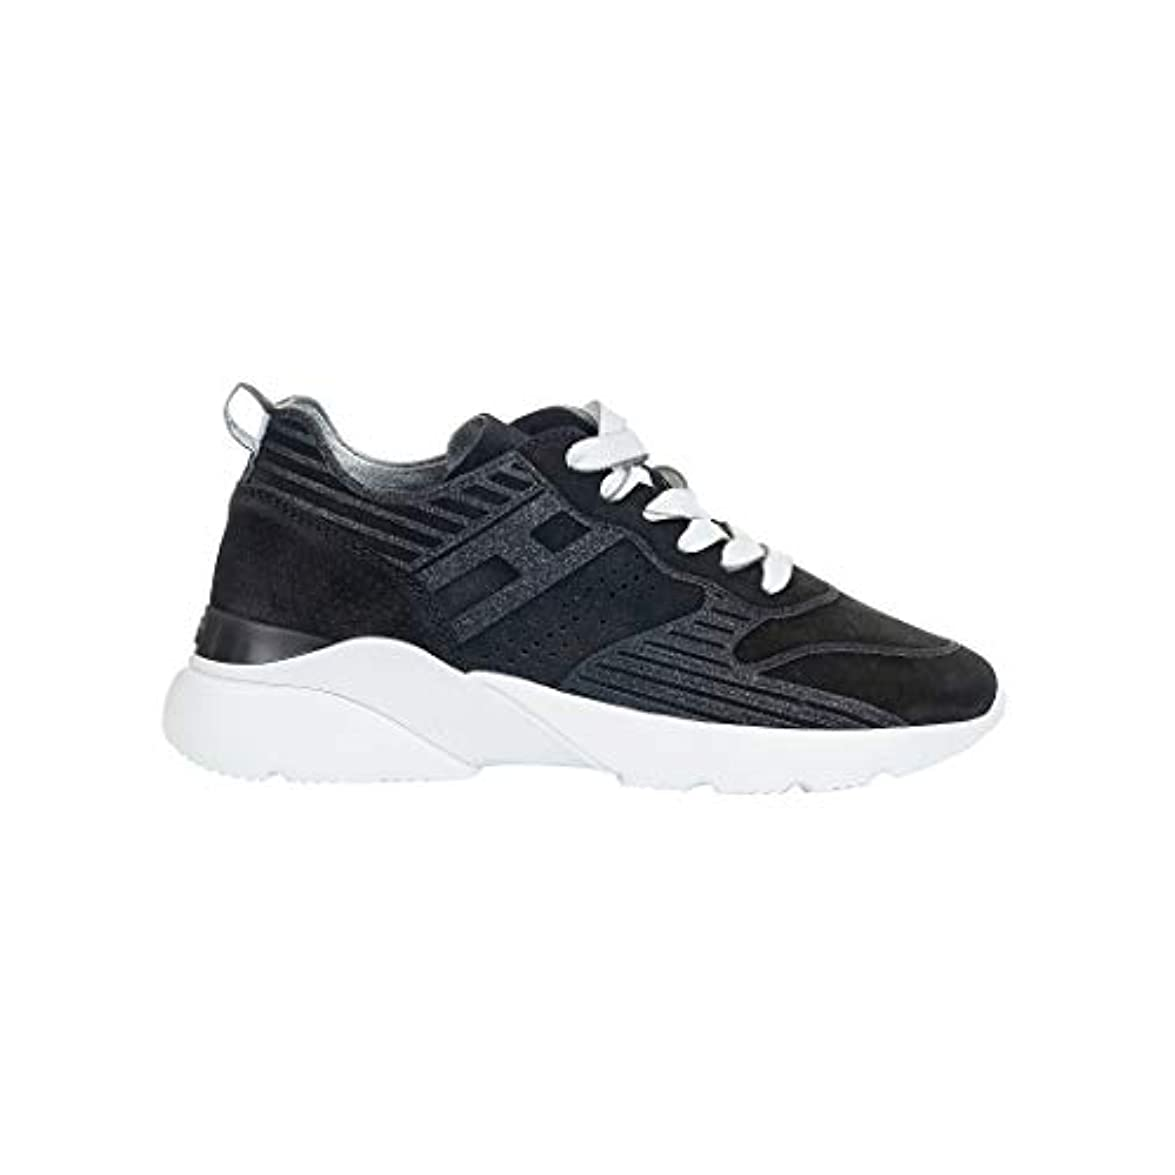 Hogan Hi Top Sneakers Donna Hxw3850bm40ffy0353 Camoscio Nero